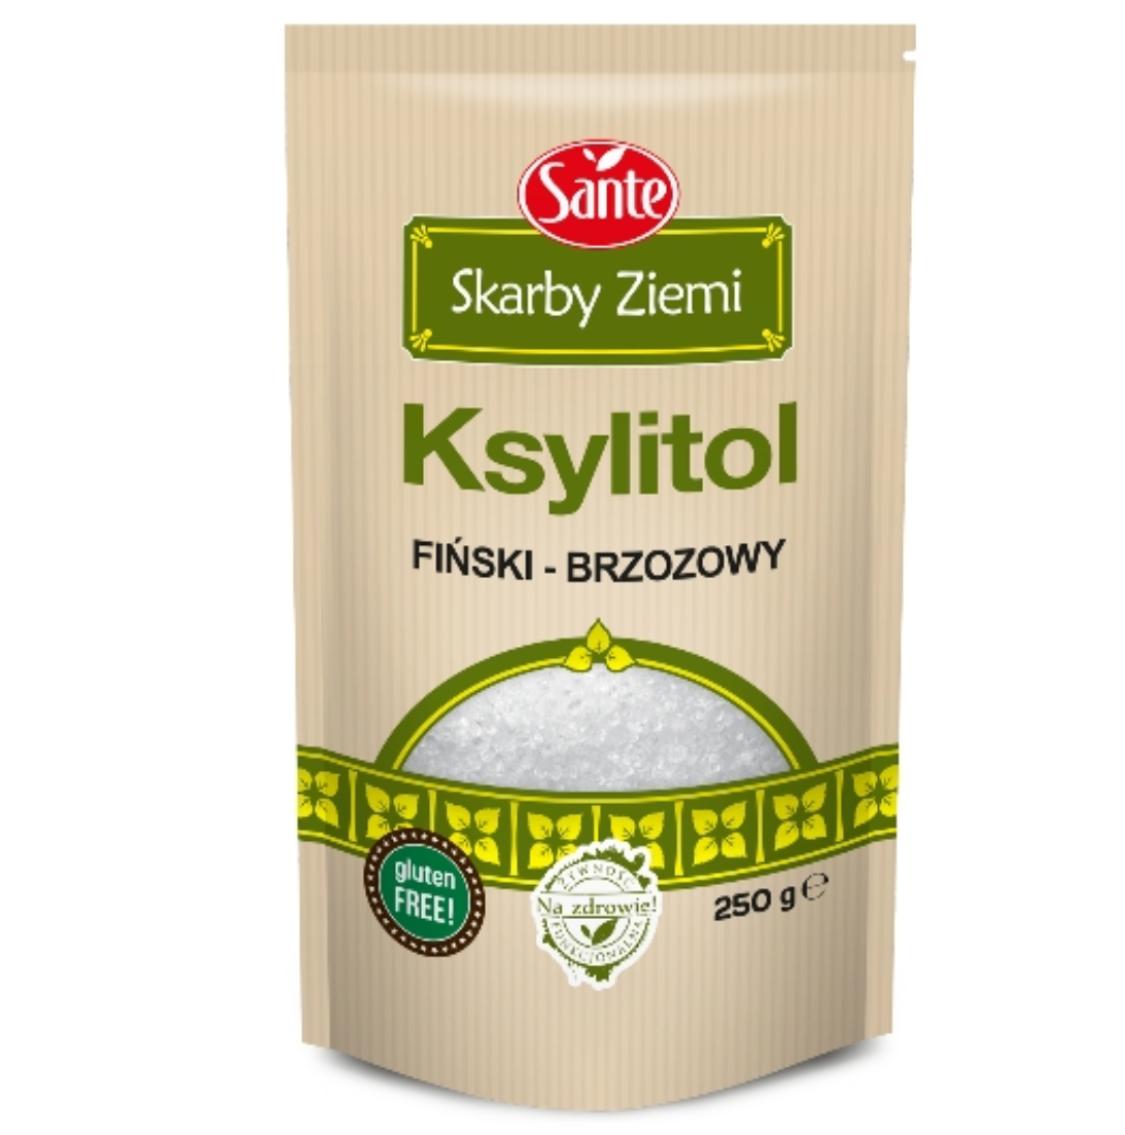 SKARBY ZIEMI KSYLITOL - SANTE 250g